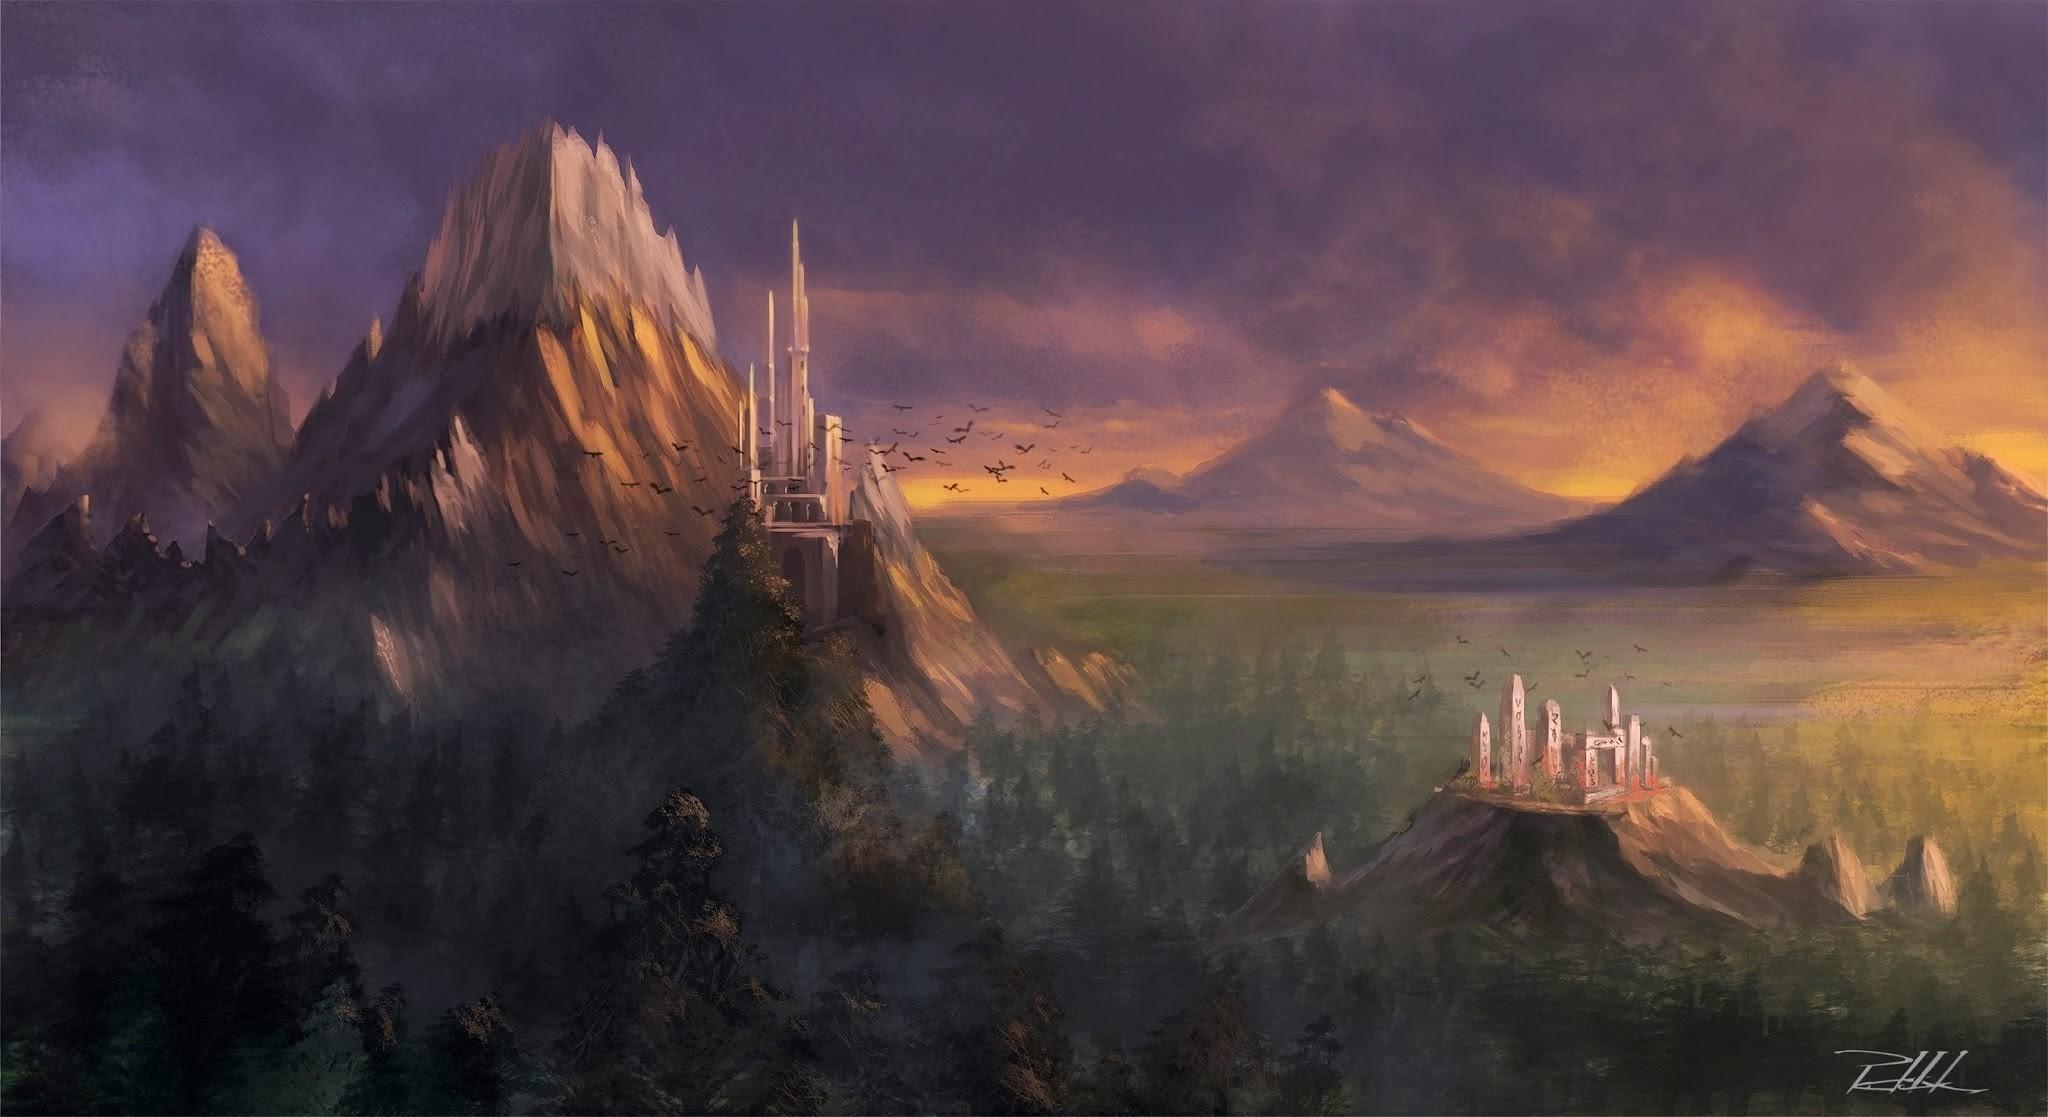 Calming Fall Wallpaper Hd Download 3840x2160 Fantasy Landscape Castle Mountain